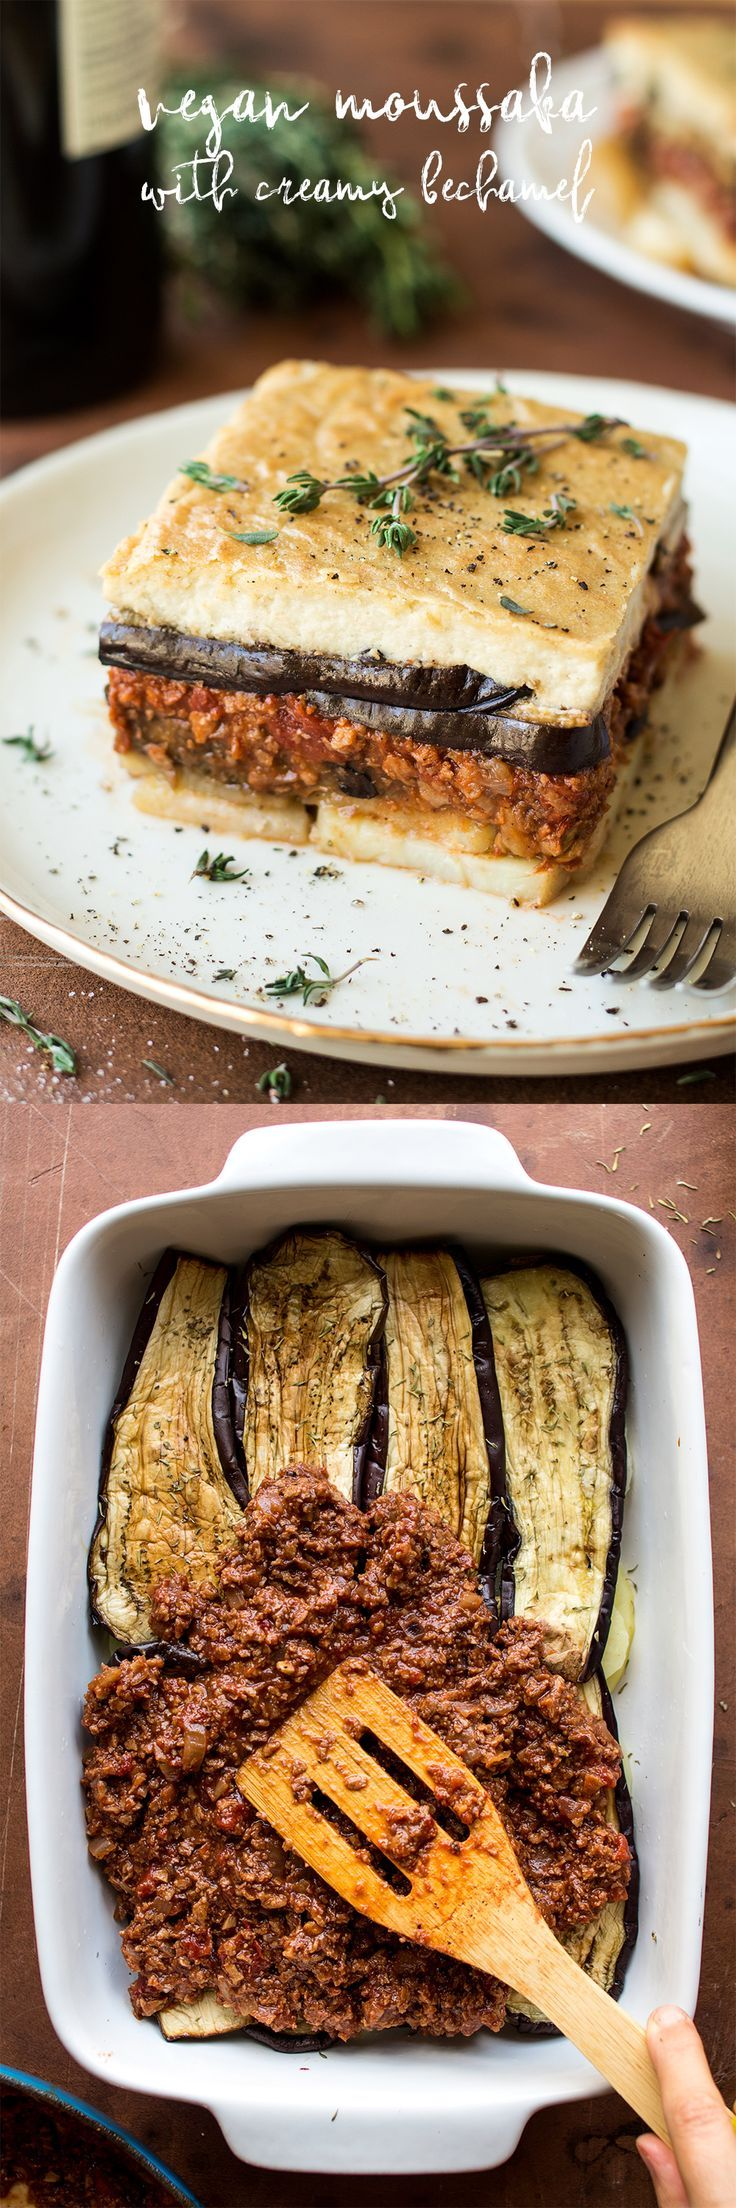 Vegan moussaka with creamy bechamel - Lazy Cat Kitchen